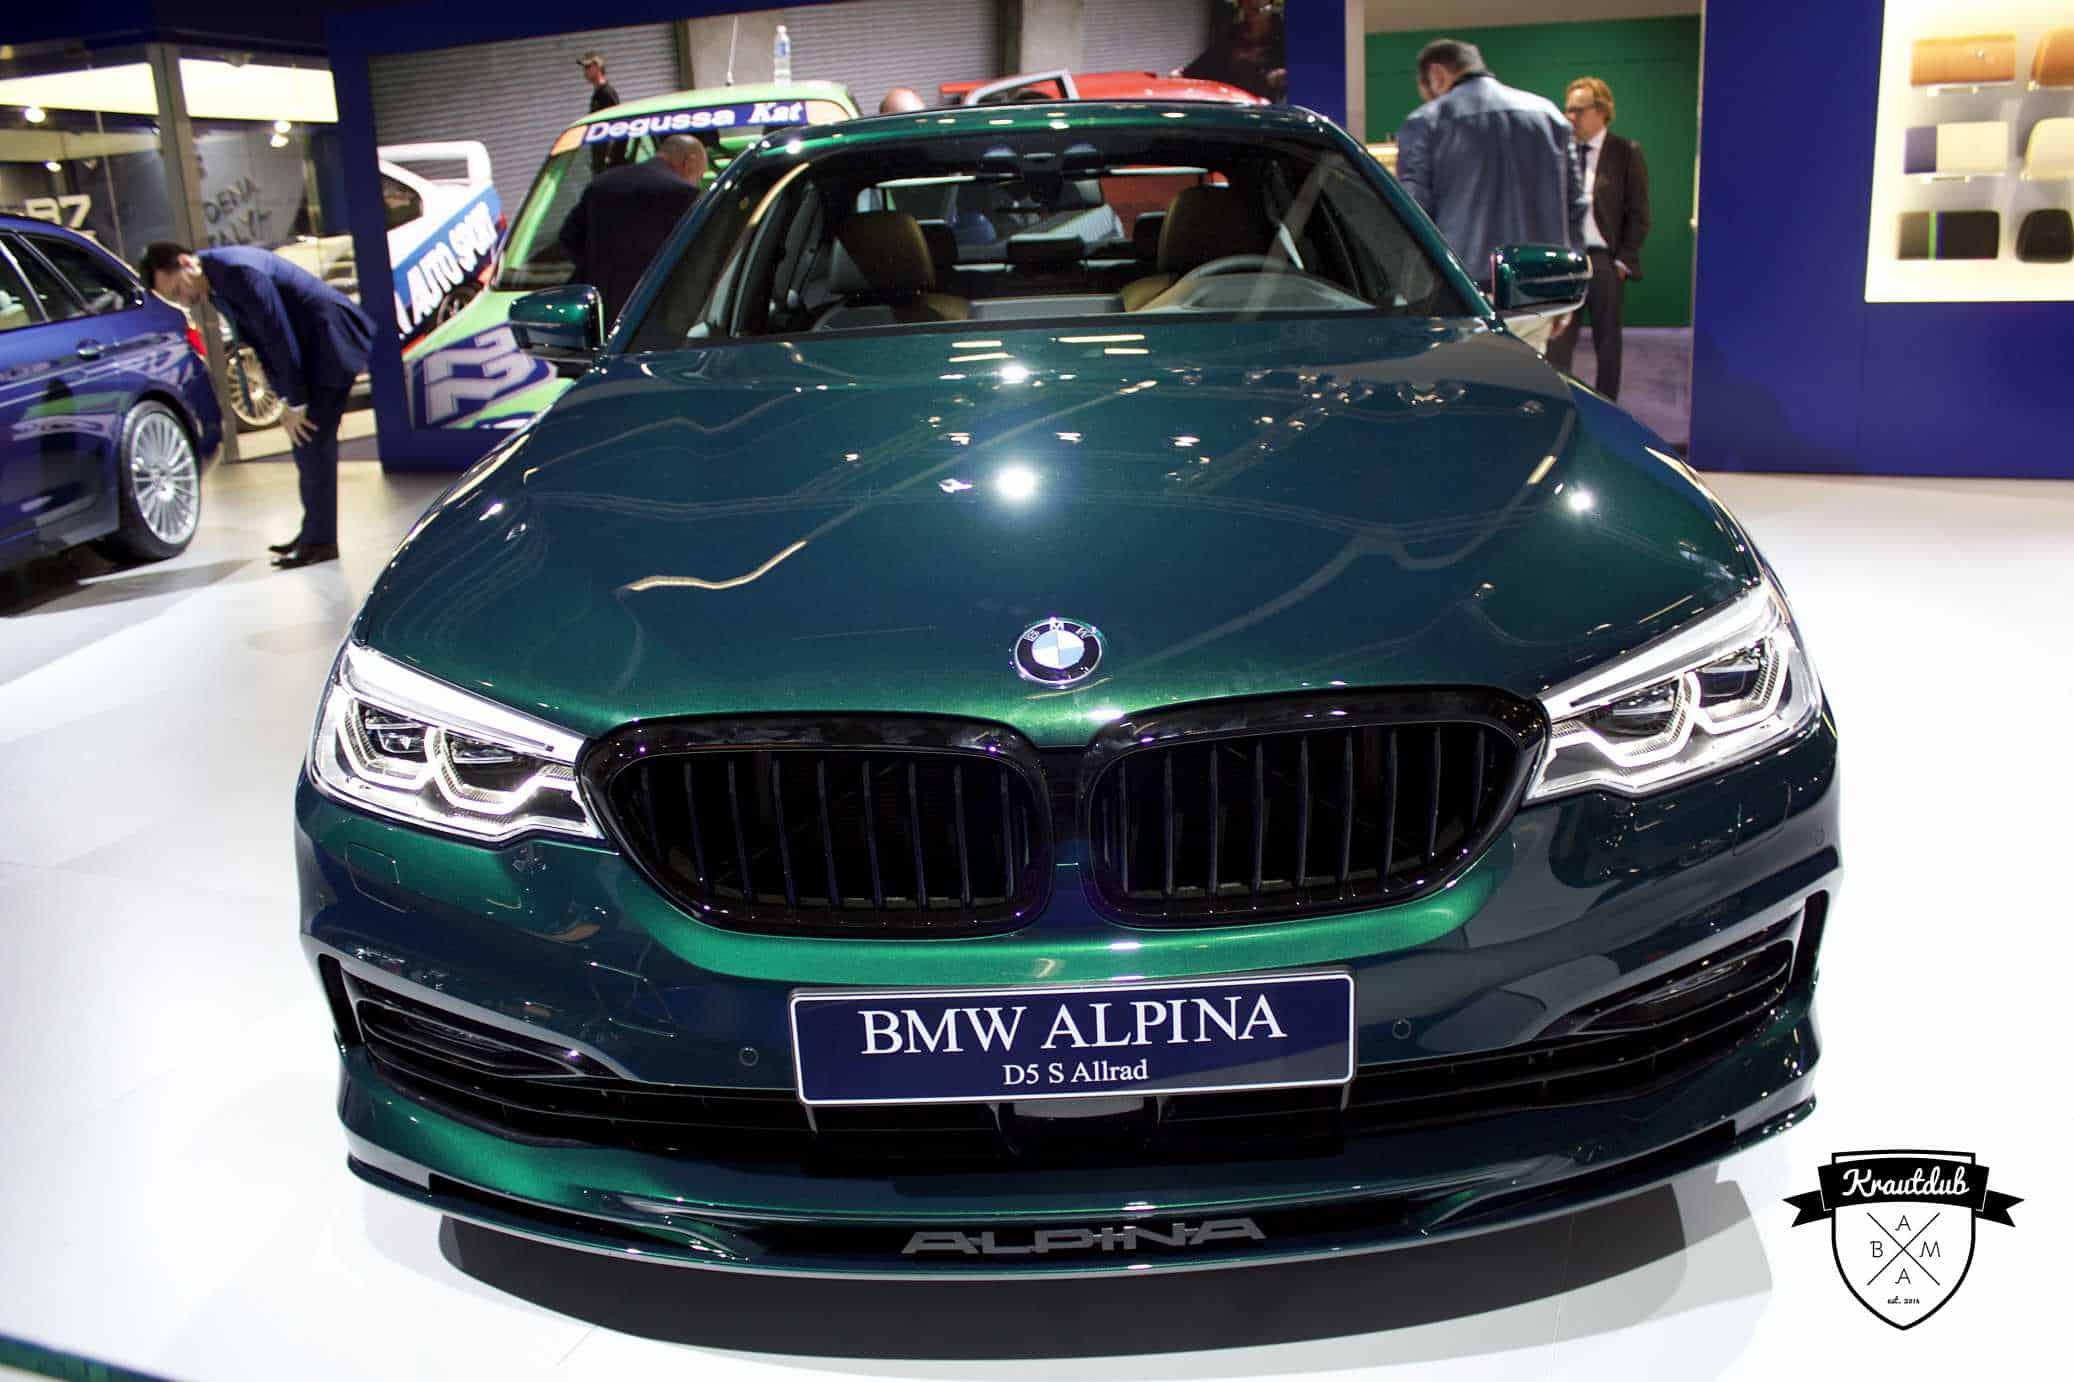 Alpina D5 S Allrad - IAA 2017